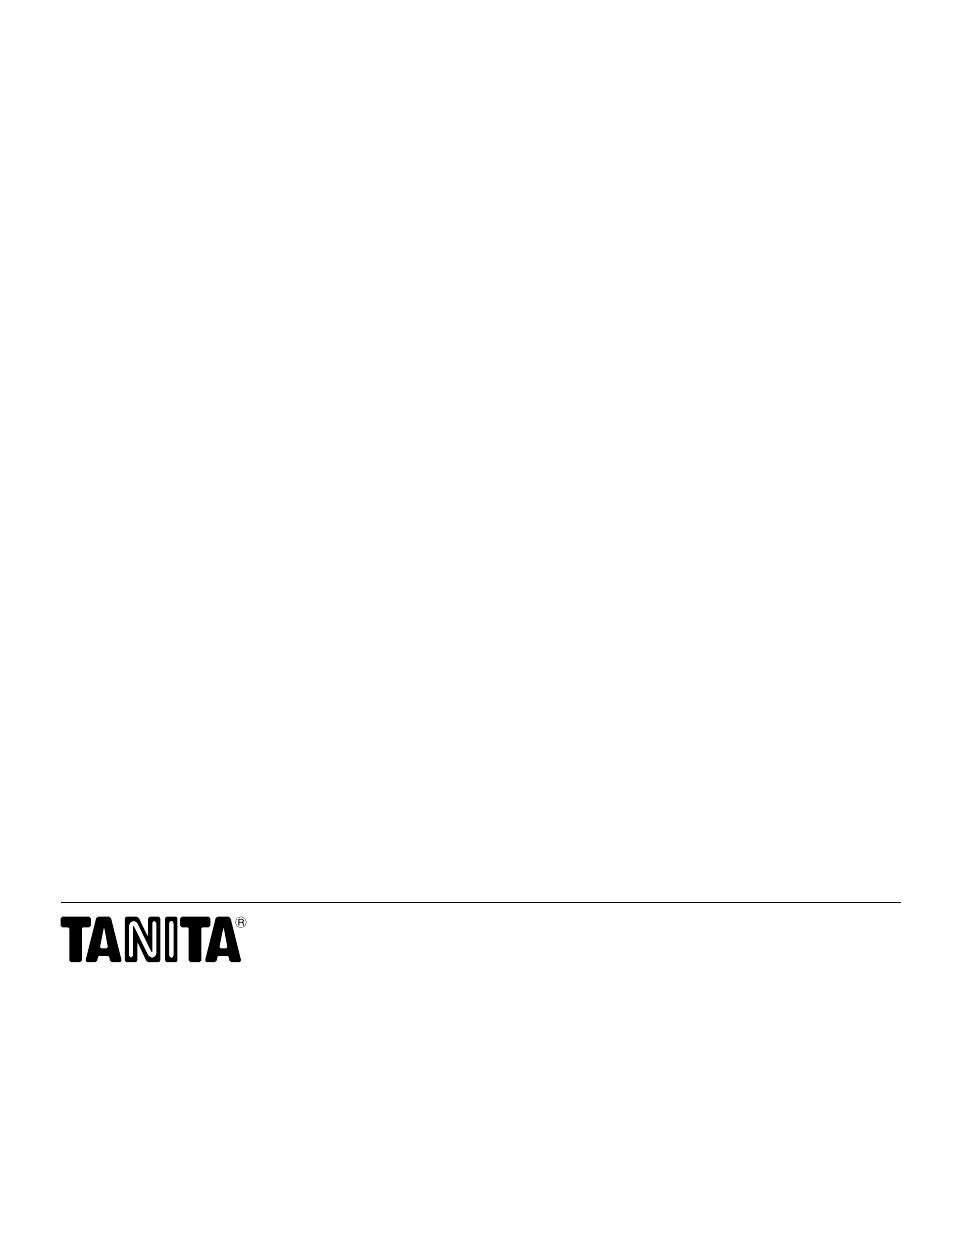 tanita tbf 604 user manual page 12 12 rh manualsdir com